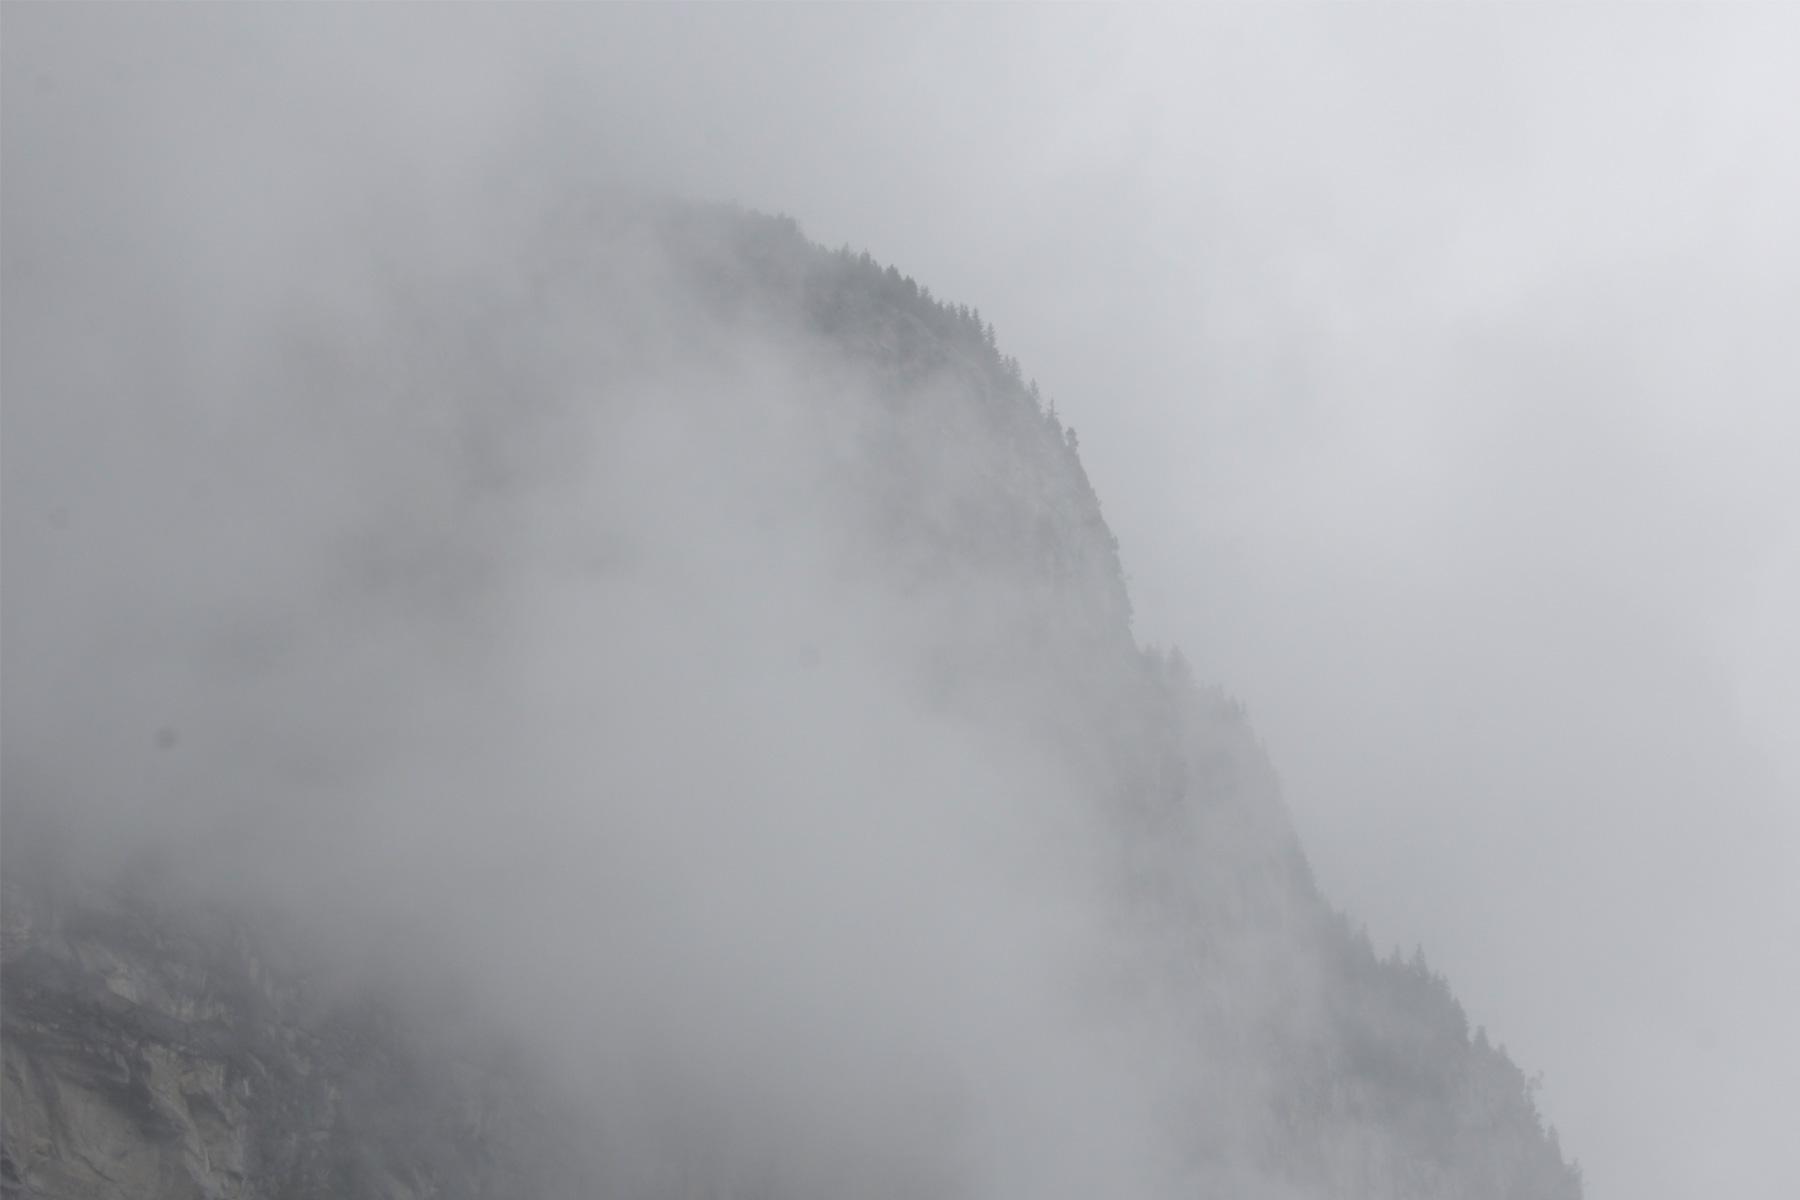 Lauterbrunnen-Valley-fog-02.jpg